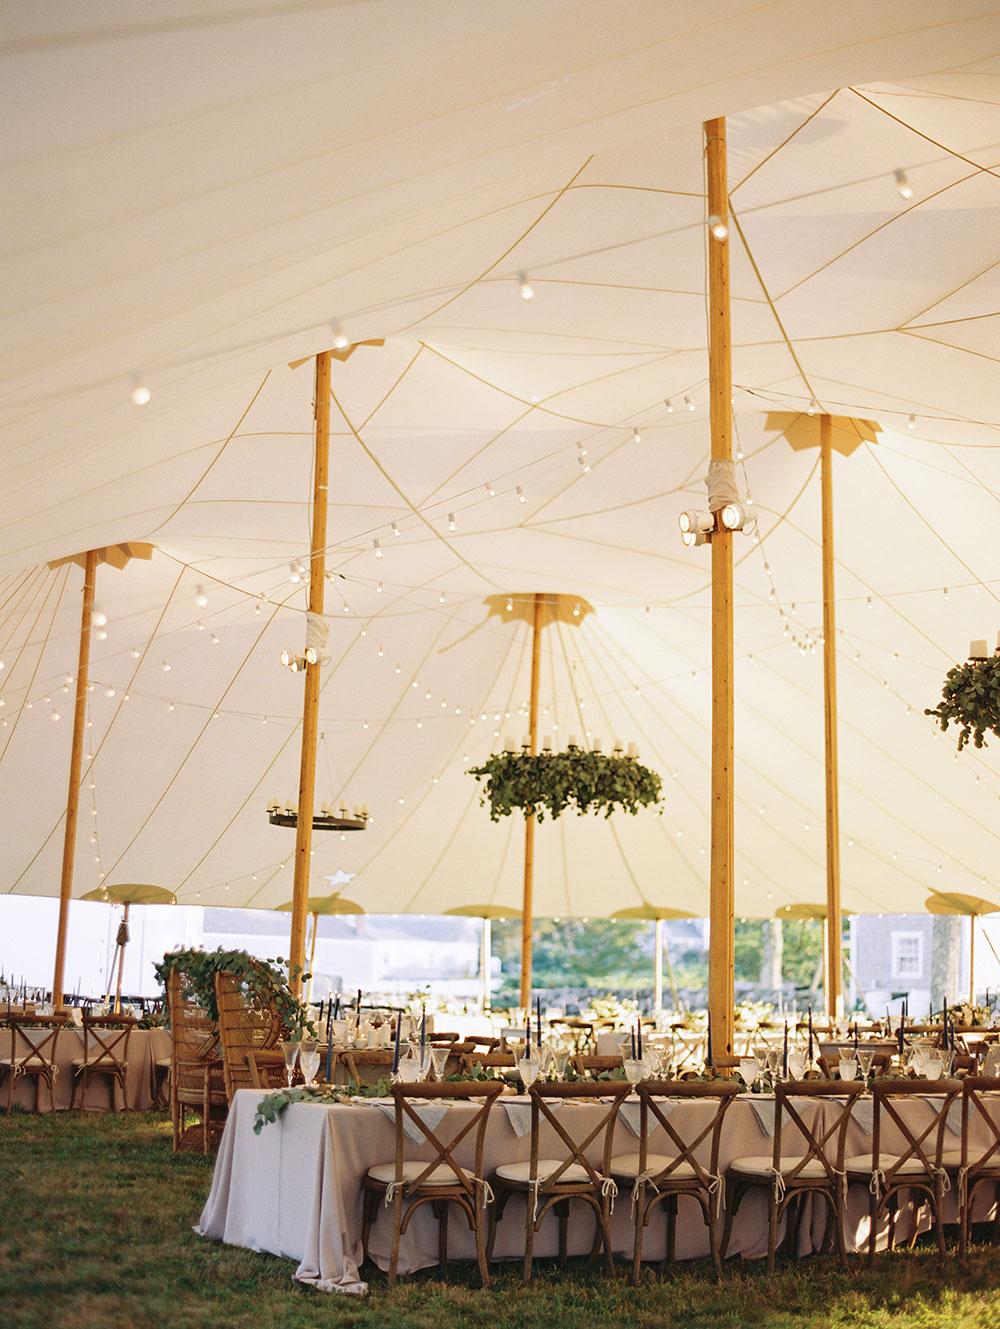 WESTPORT PRIVATE RESIDENCE WEDDING by Boston based designer mStarr design